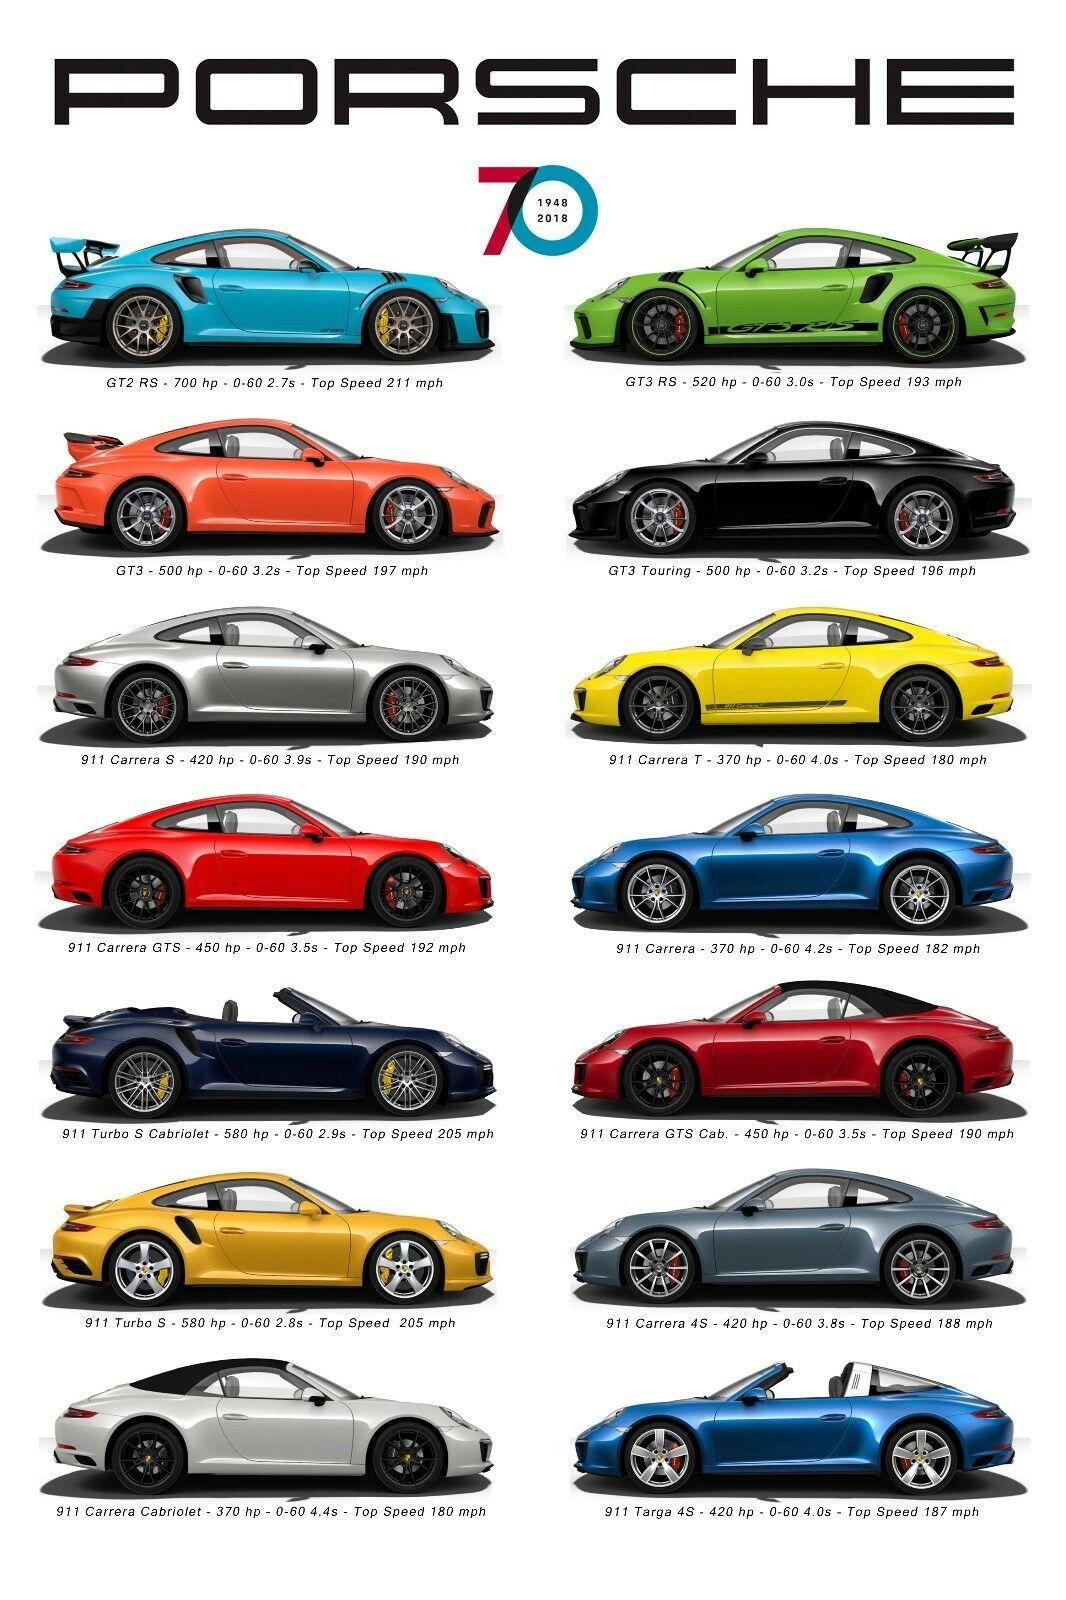 Porsche 911 70th Anniversary Poster 911 991 2 Models Porsche 911 Porsche Porsche Sports Car